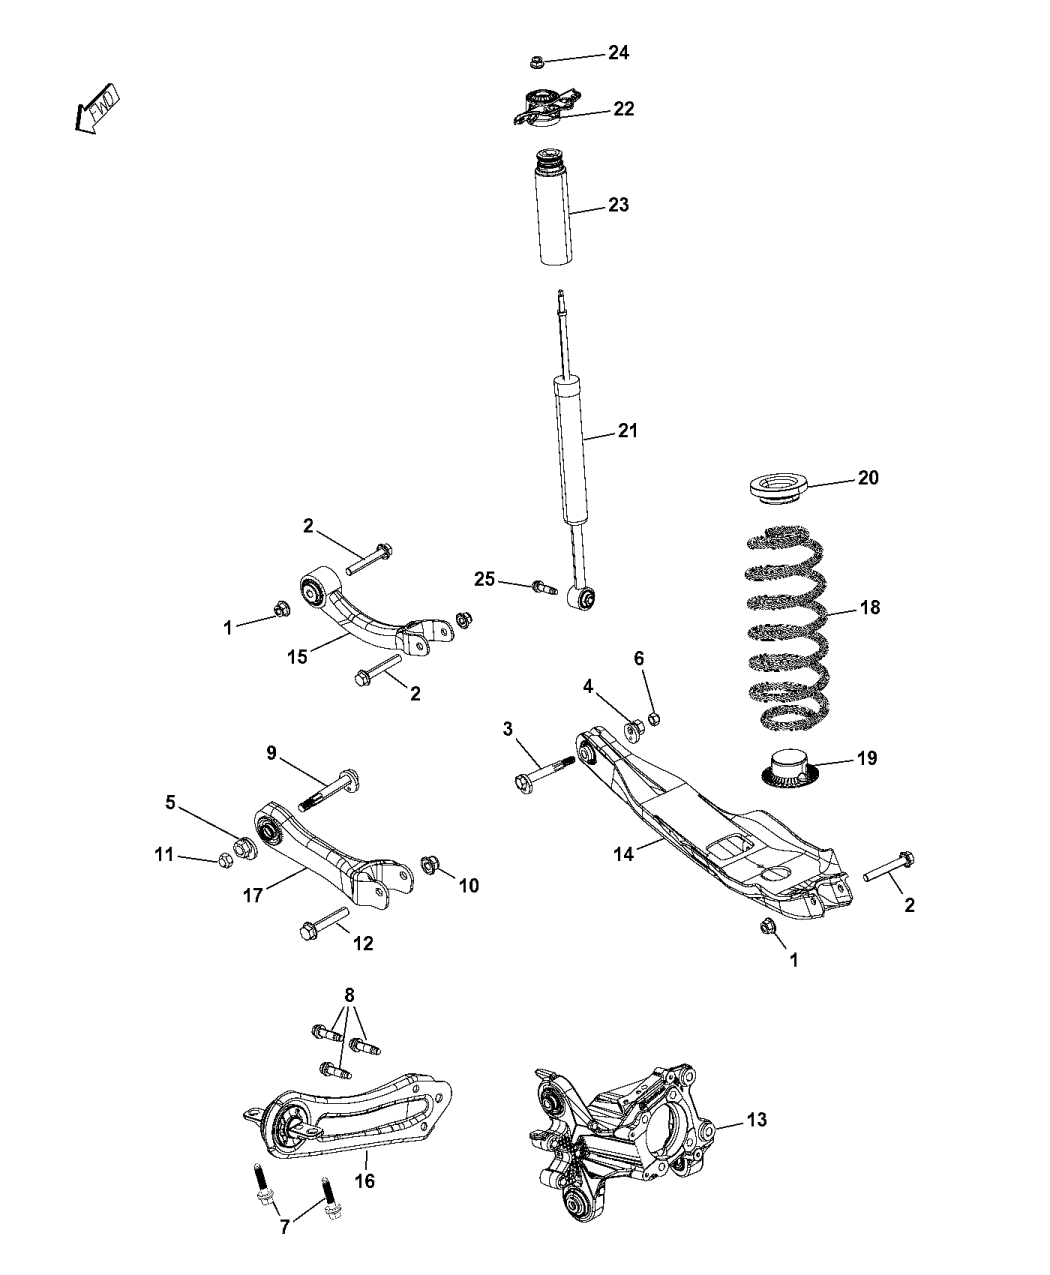 68224868ac Genuine Jeep Absorber Suspension Diagram 2014 Cherokee Rear